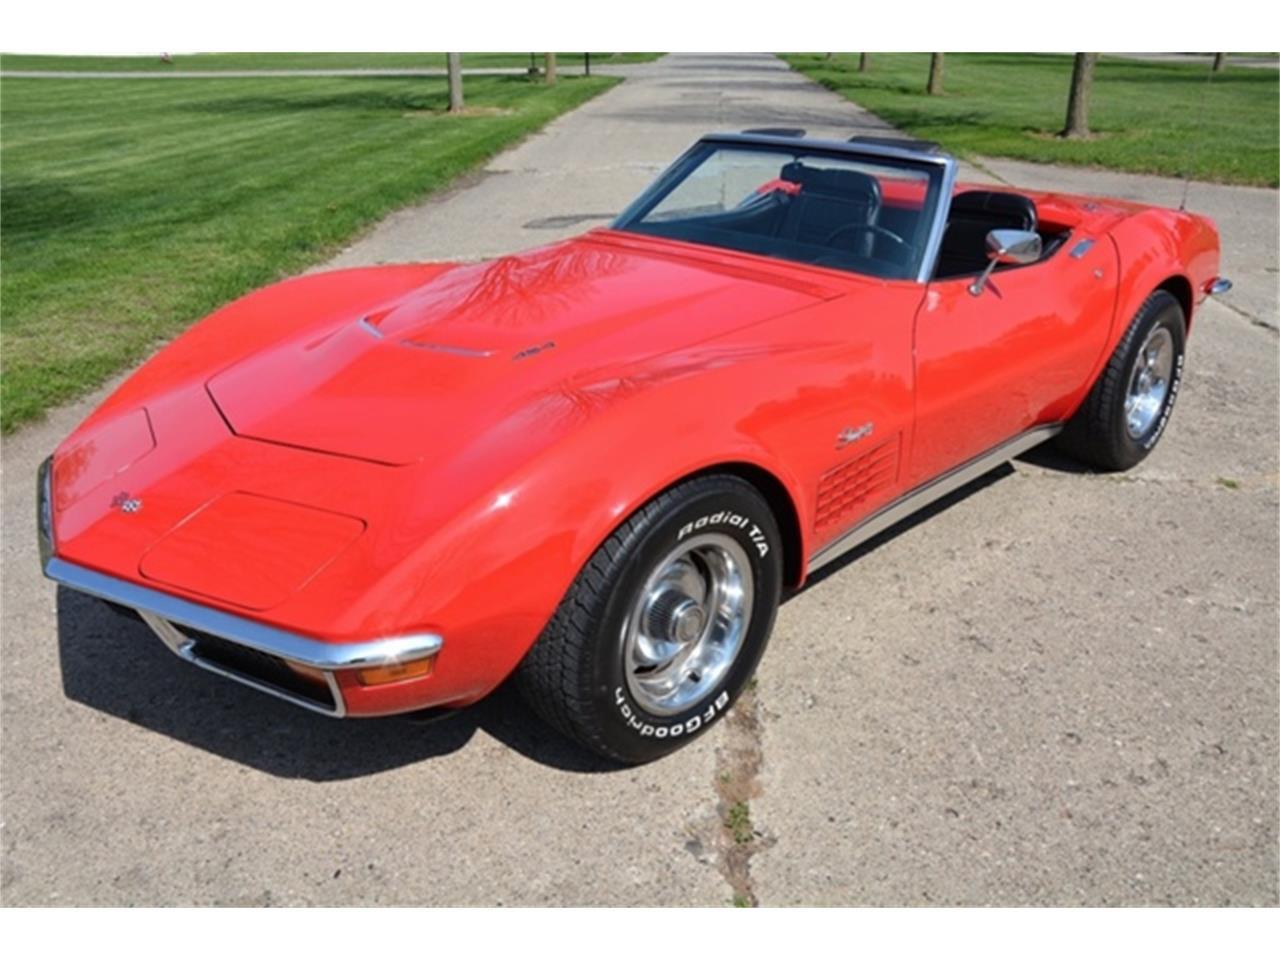 Large Picture of Classic '72 Chevrolet Corvette located in Michigan - LAFE